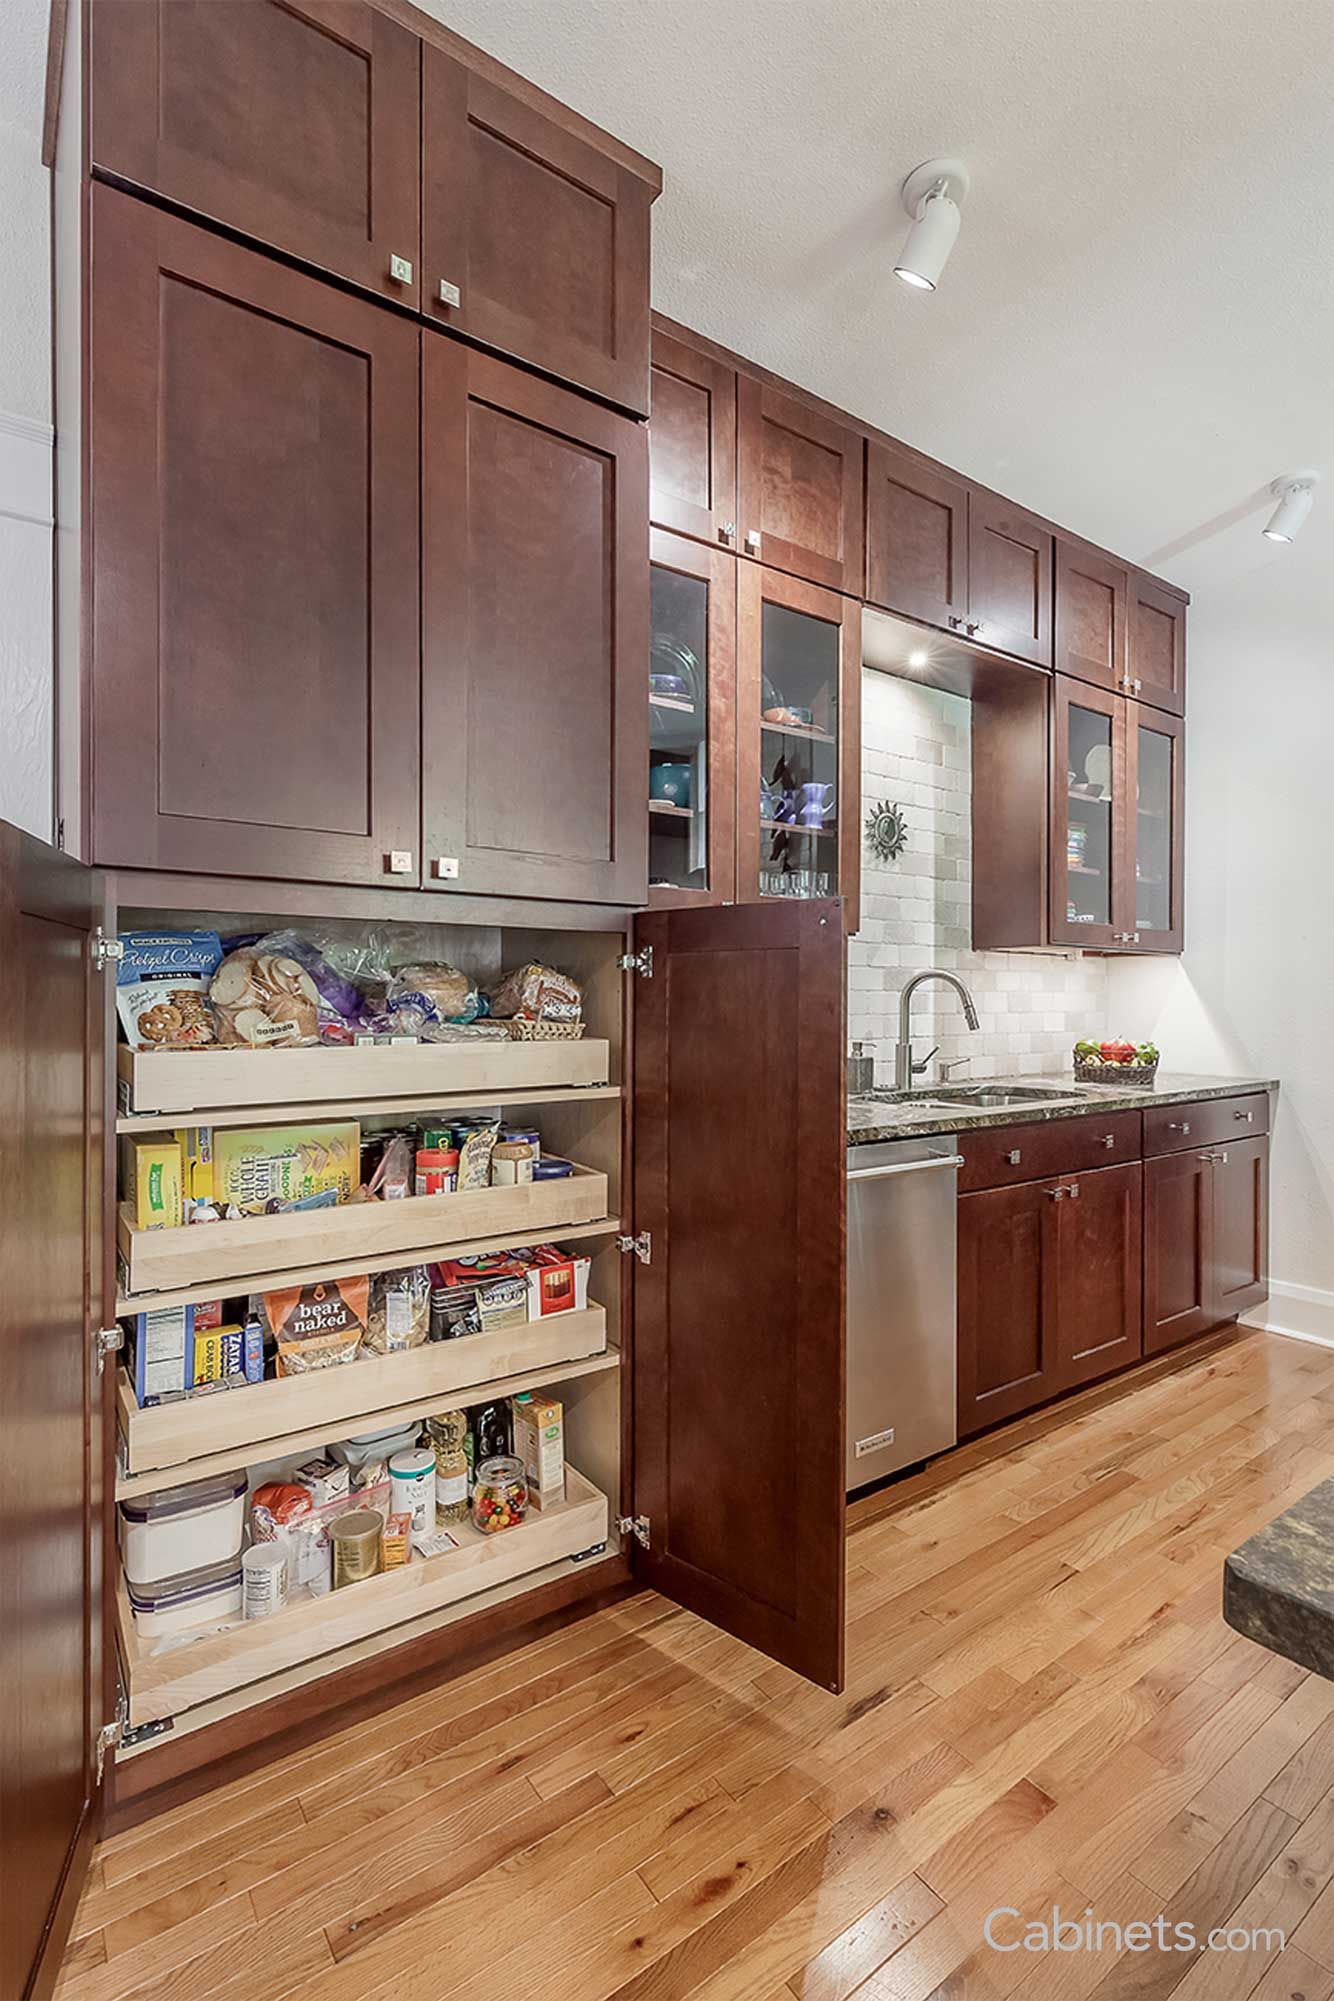 Shaker Cherry Java Online Kitchen Cabinets Buy Kitchen Cabinets Buy Kitchen